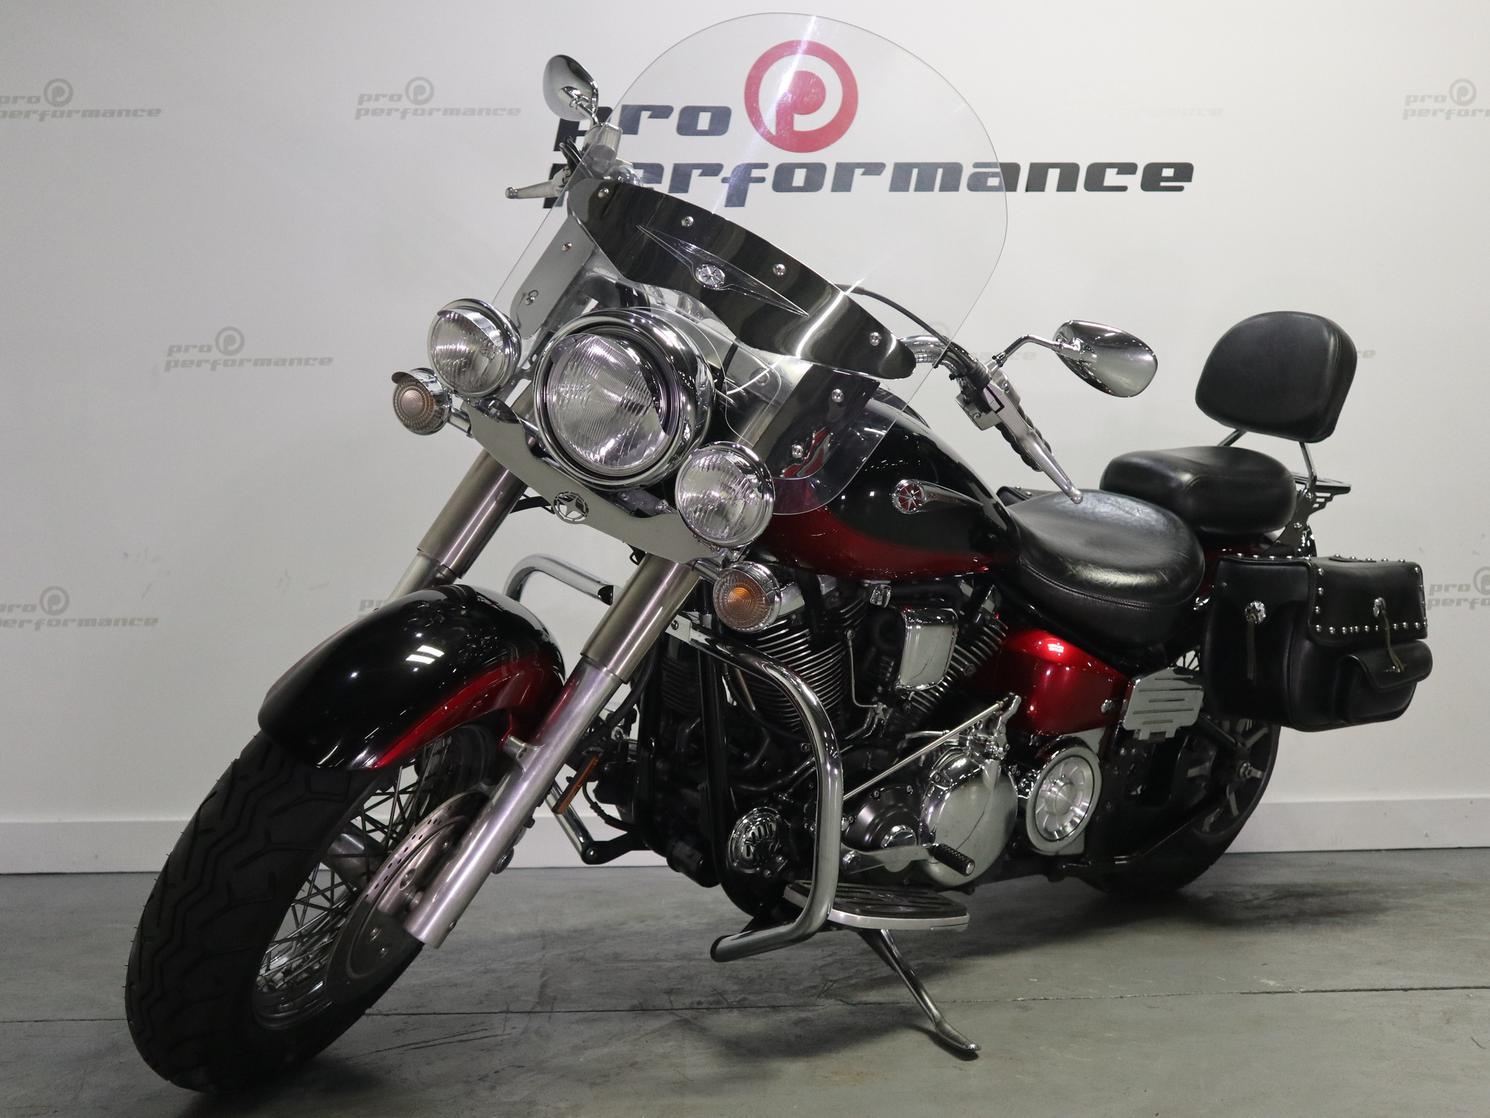 2004 Yamaha Road Star XV1700